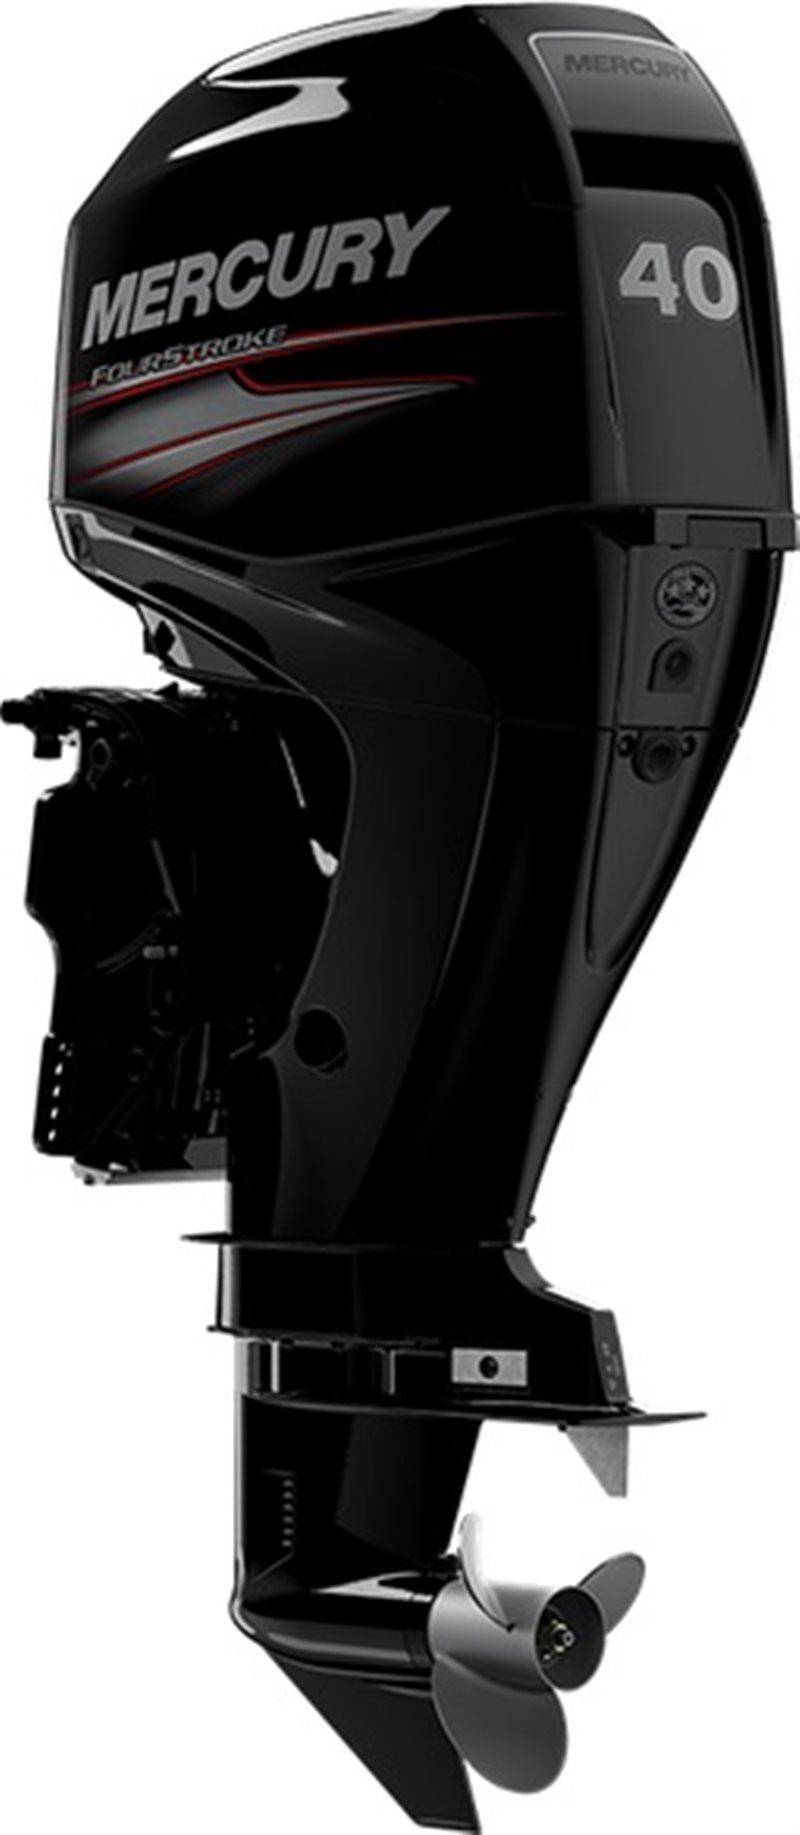 2021 Mercury Outboard FourStroke 40-60 hp 40 3-Cylinder at Pharo Marine, Waunakee, WI 53597